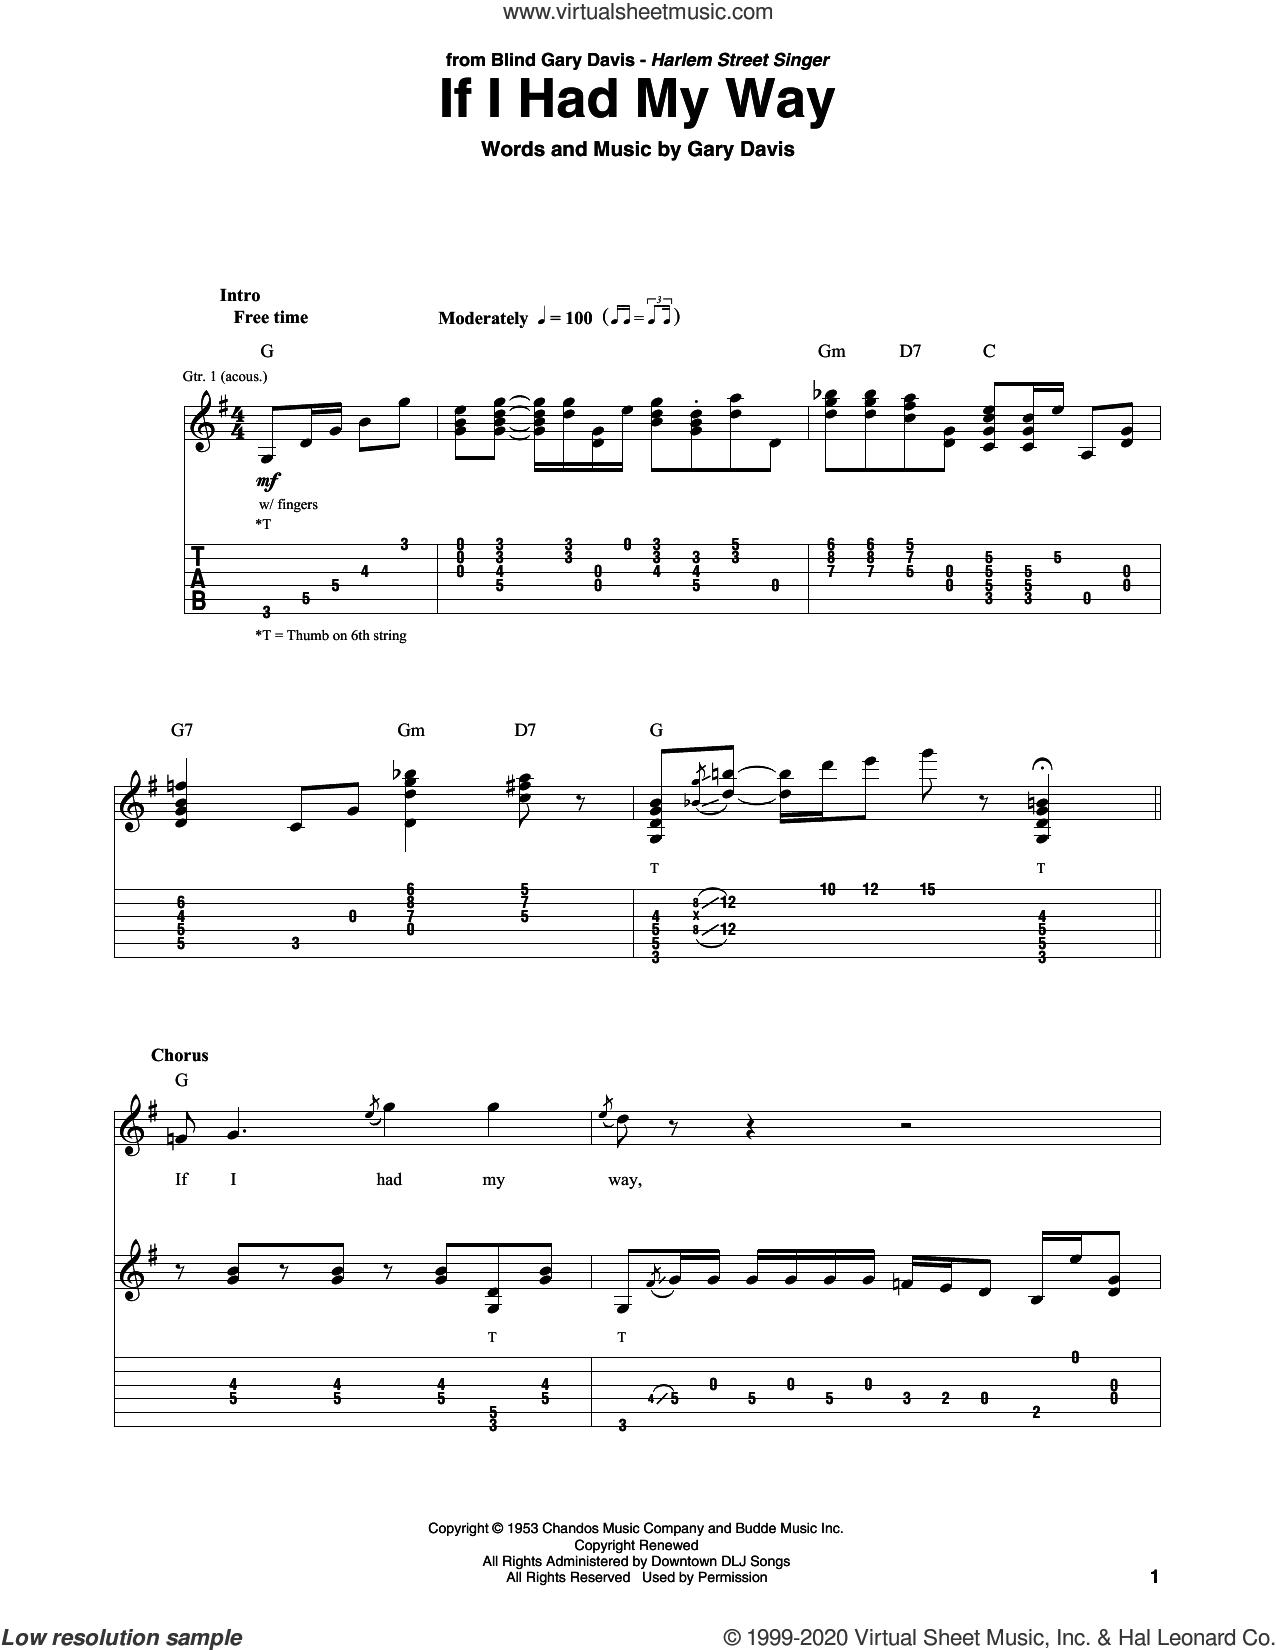 If I Had My Way sheet music for guitar solo by Gary Davis, intermediate skill level